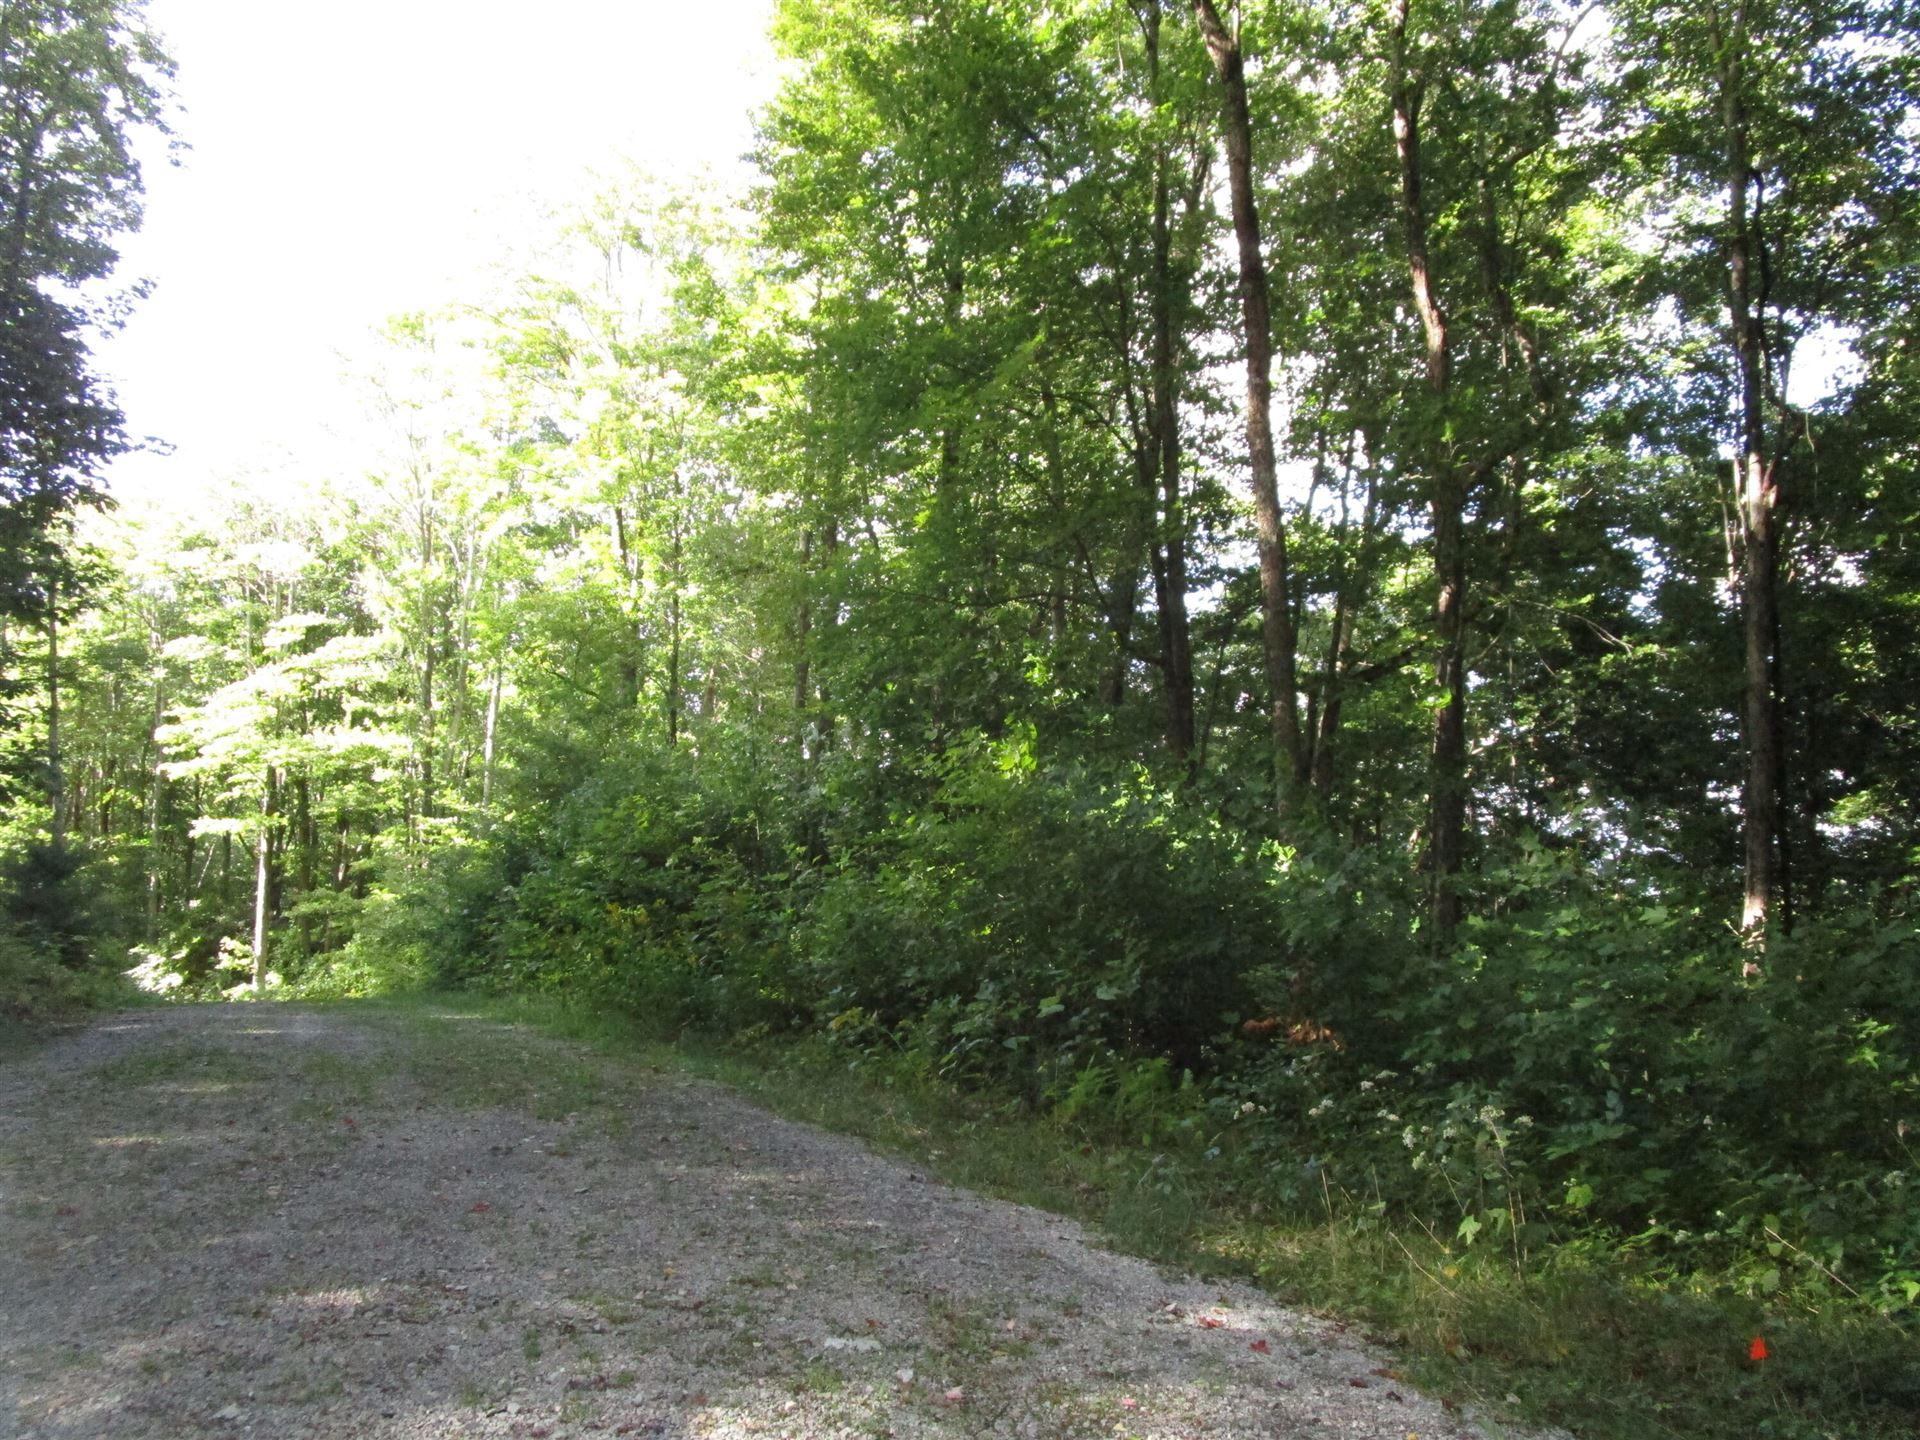 Photo of Lot 7 Wilderness Road, Unicoi, TN 37692 (MLS # 9928834)